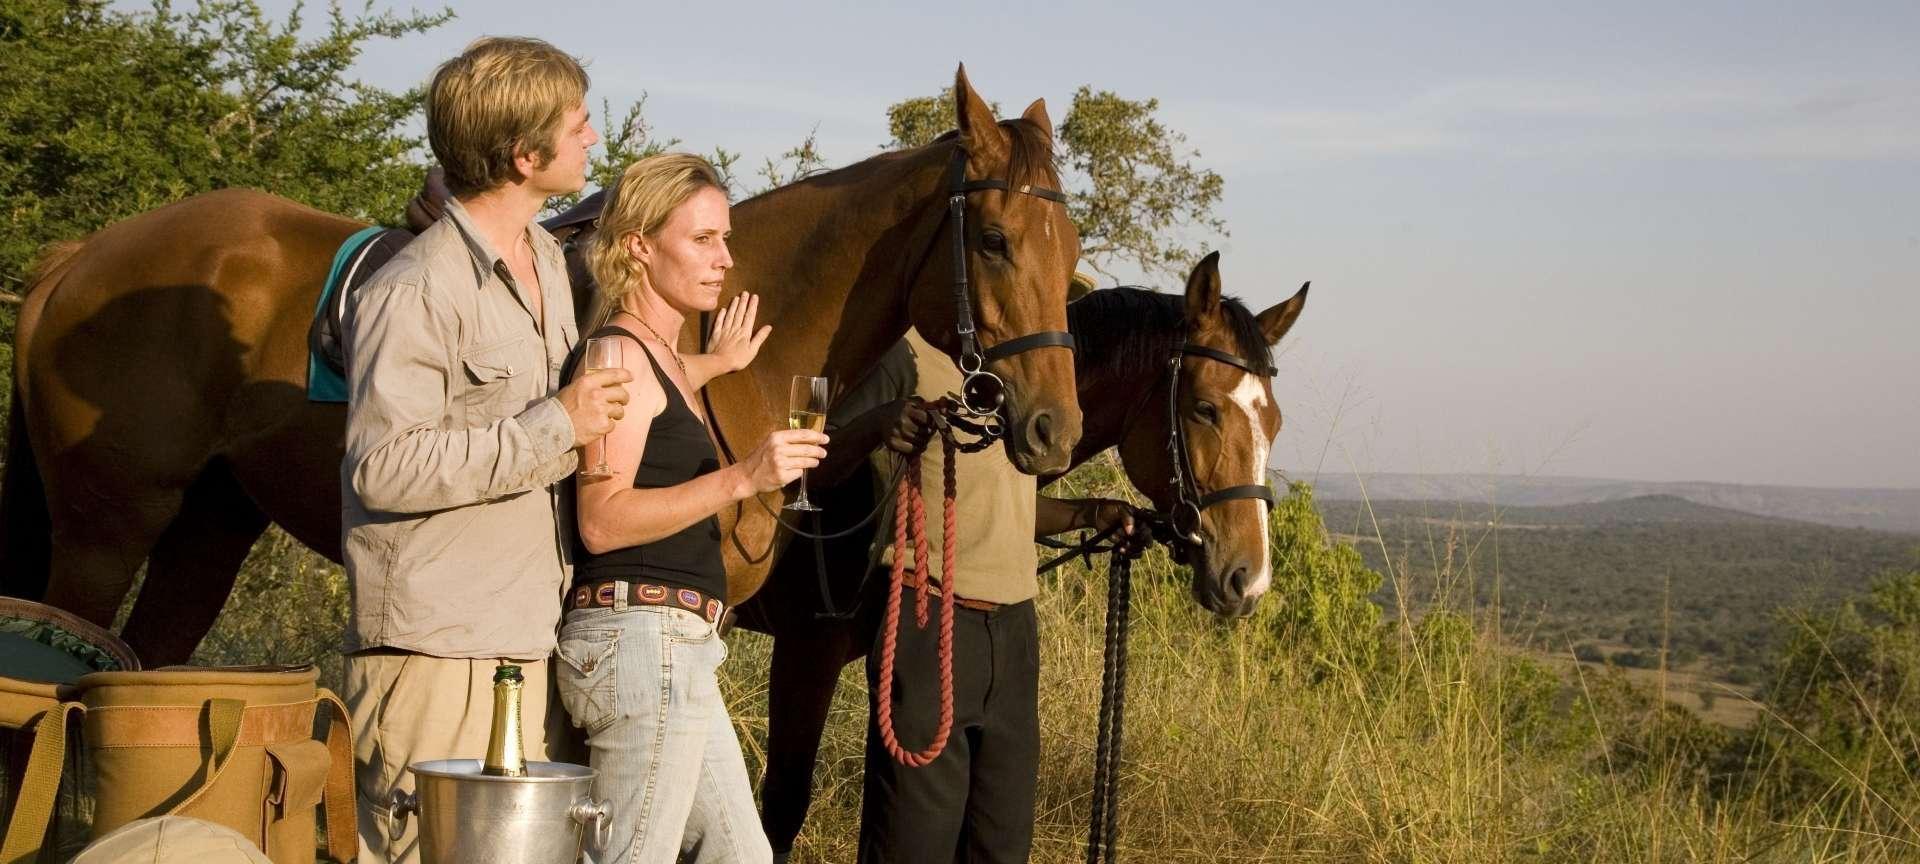 Horseback safaris in South Africa - Africa Wildlife Safaris